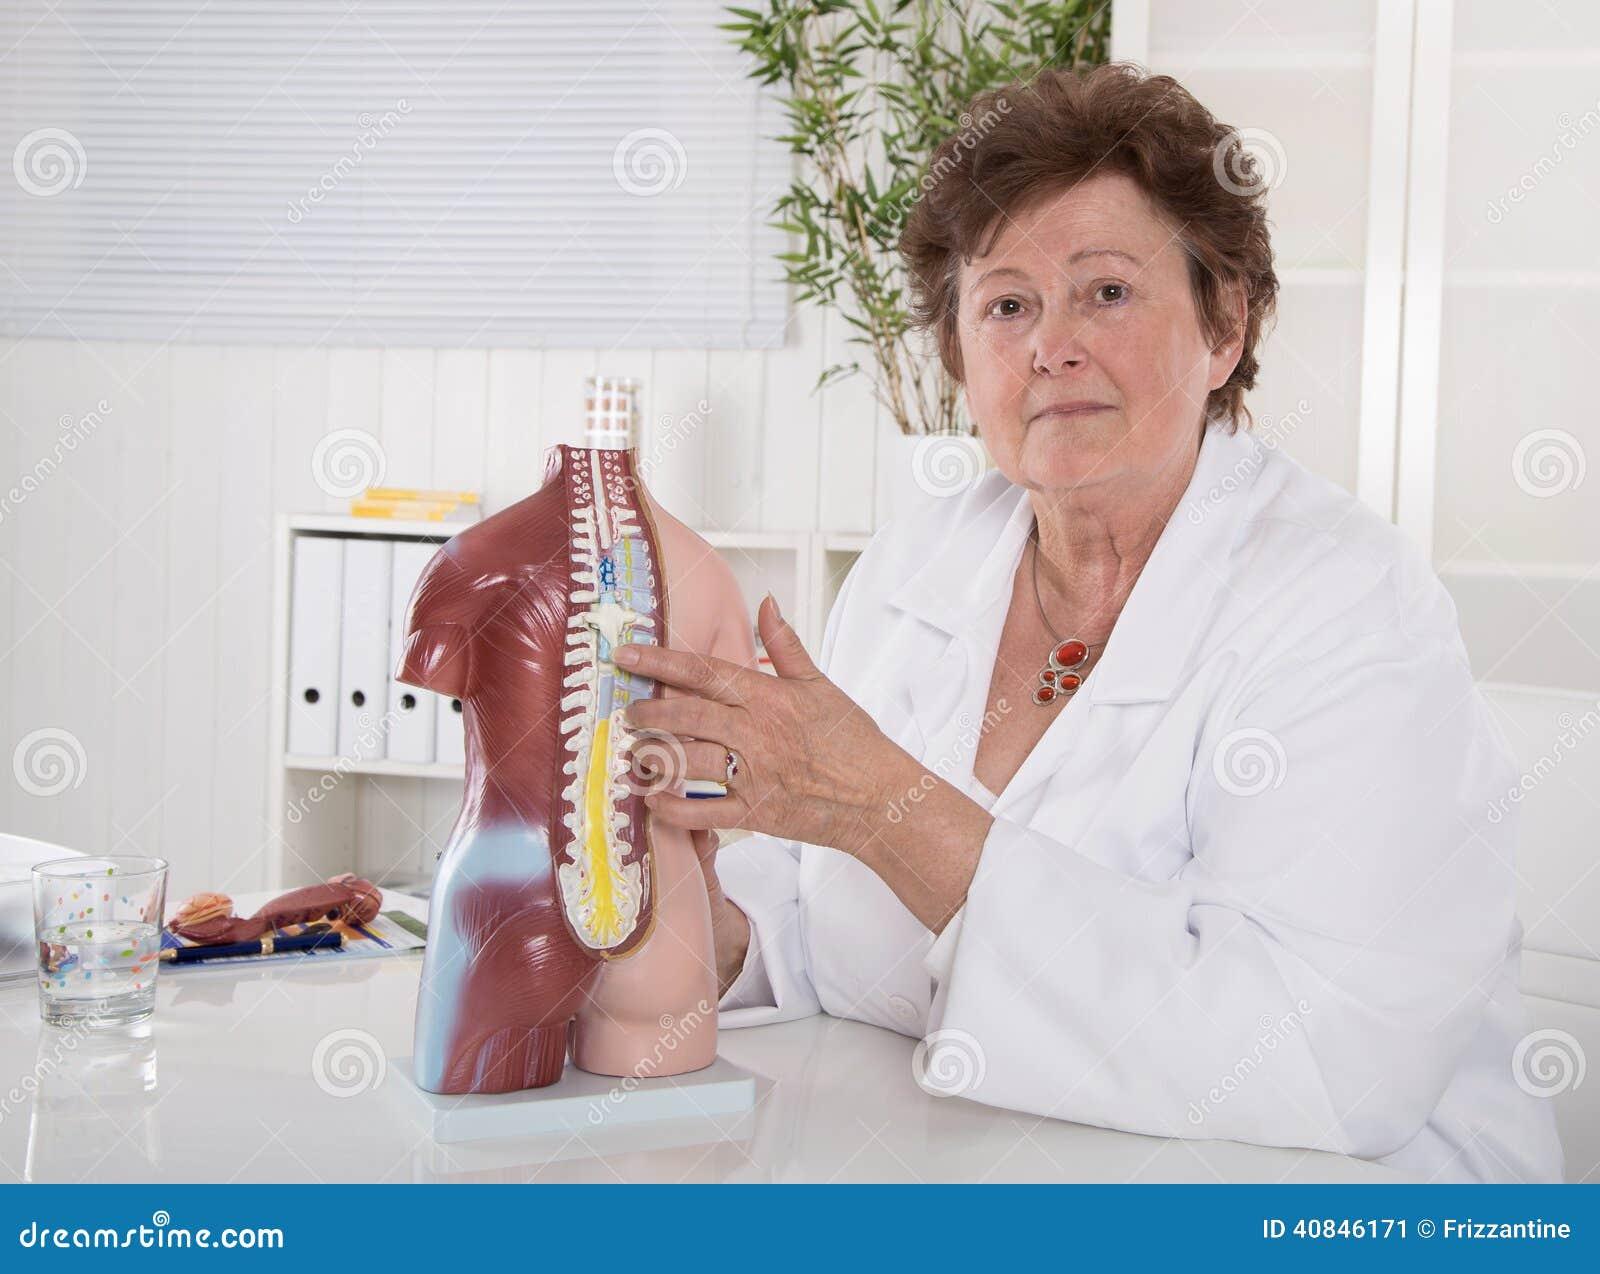 Senior female doctor explaining the human body with torso.